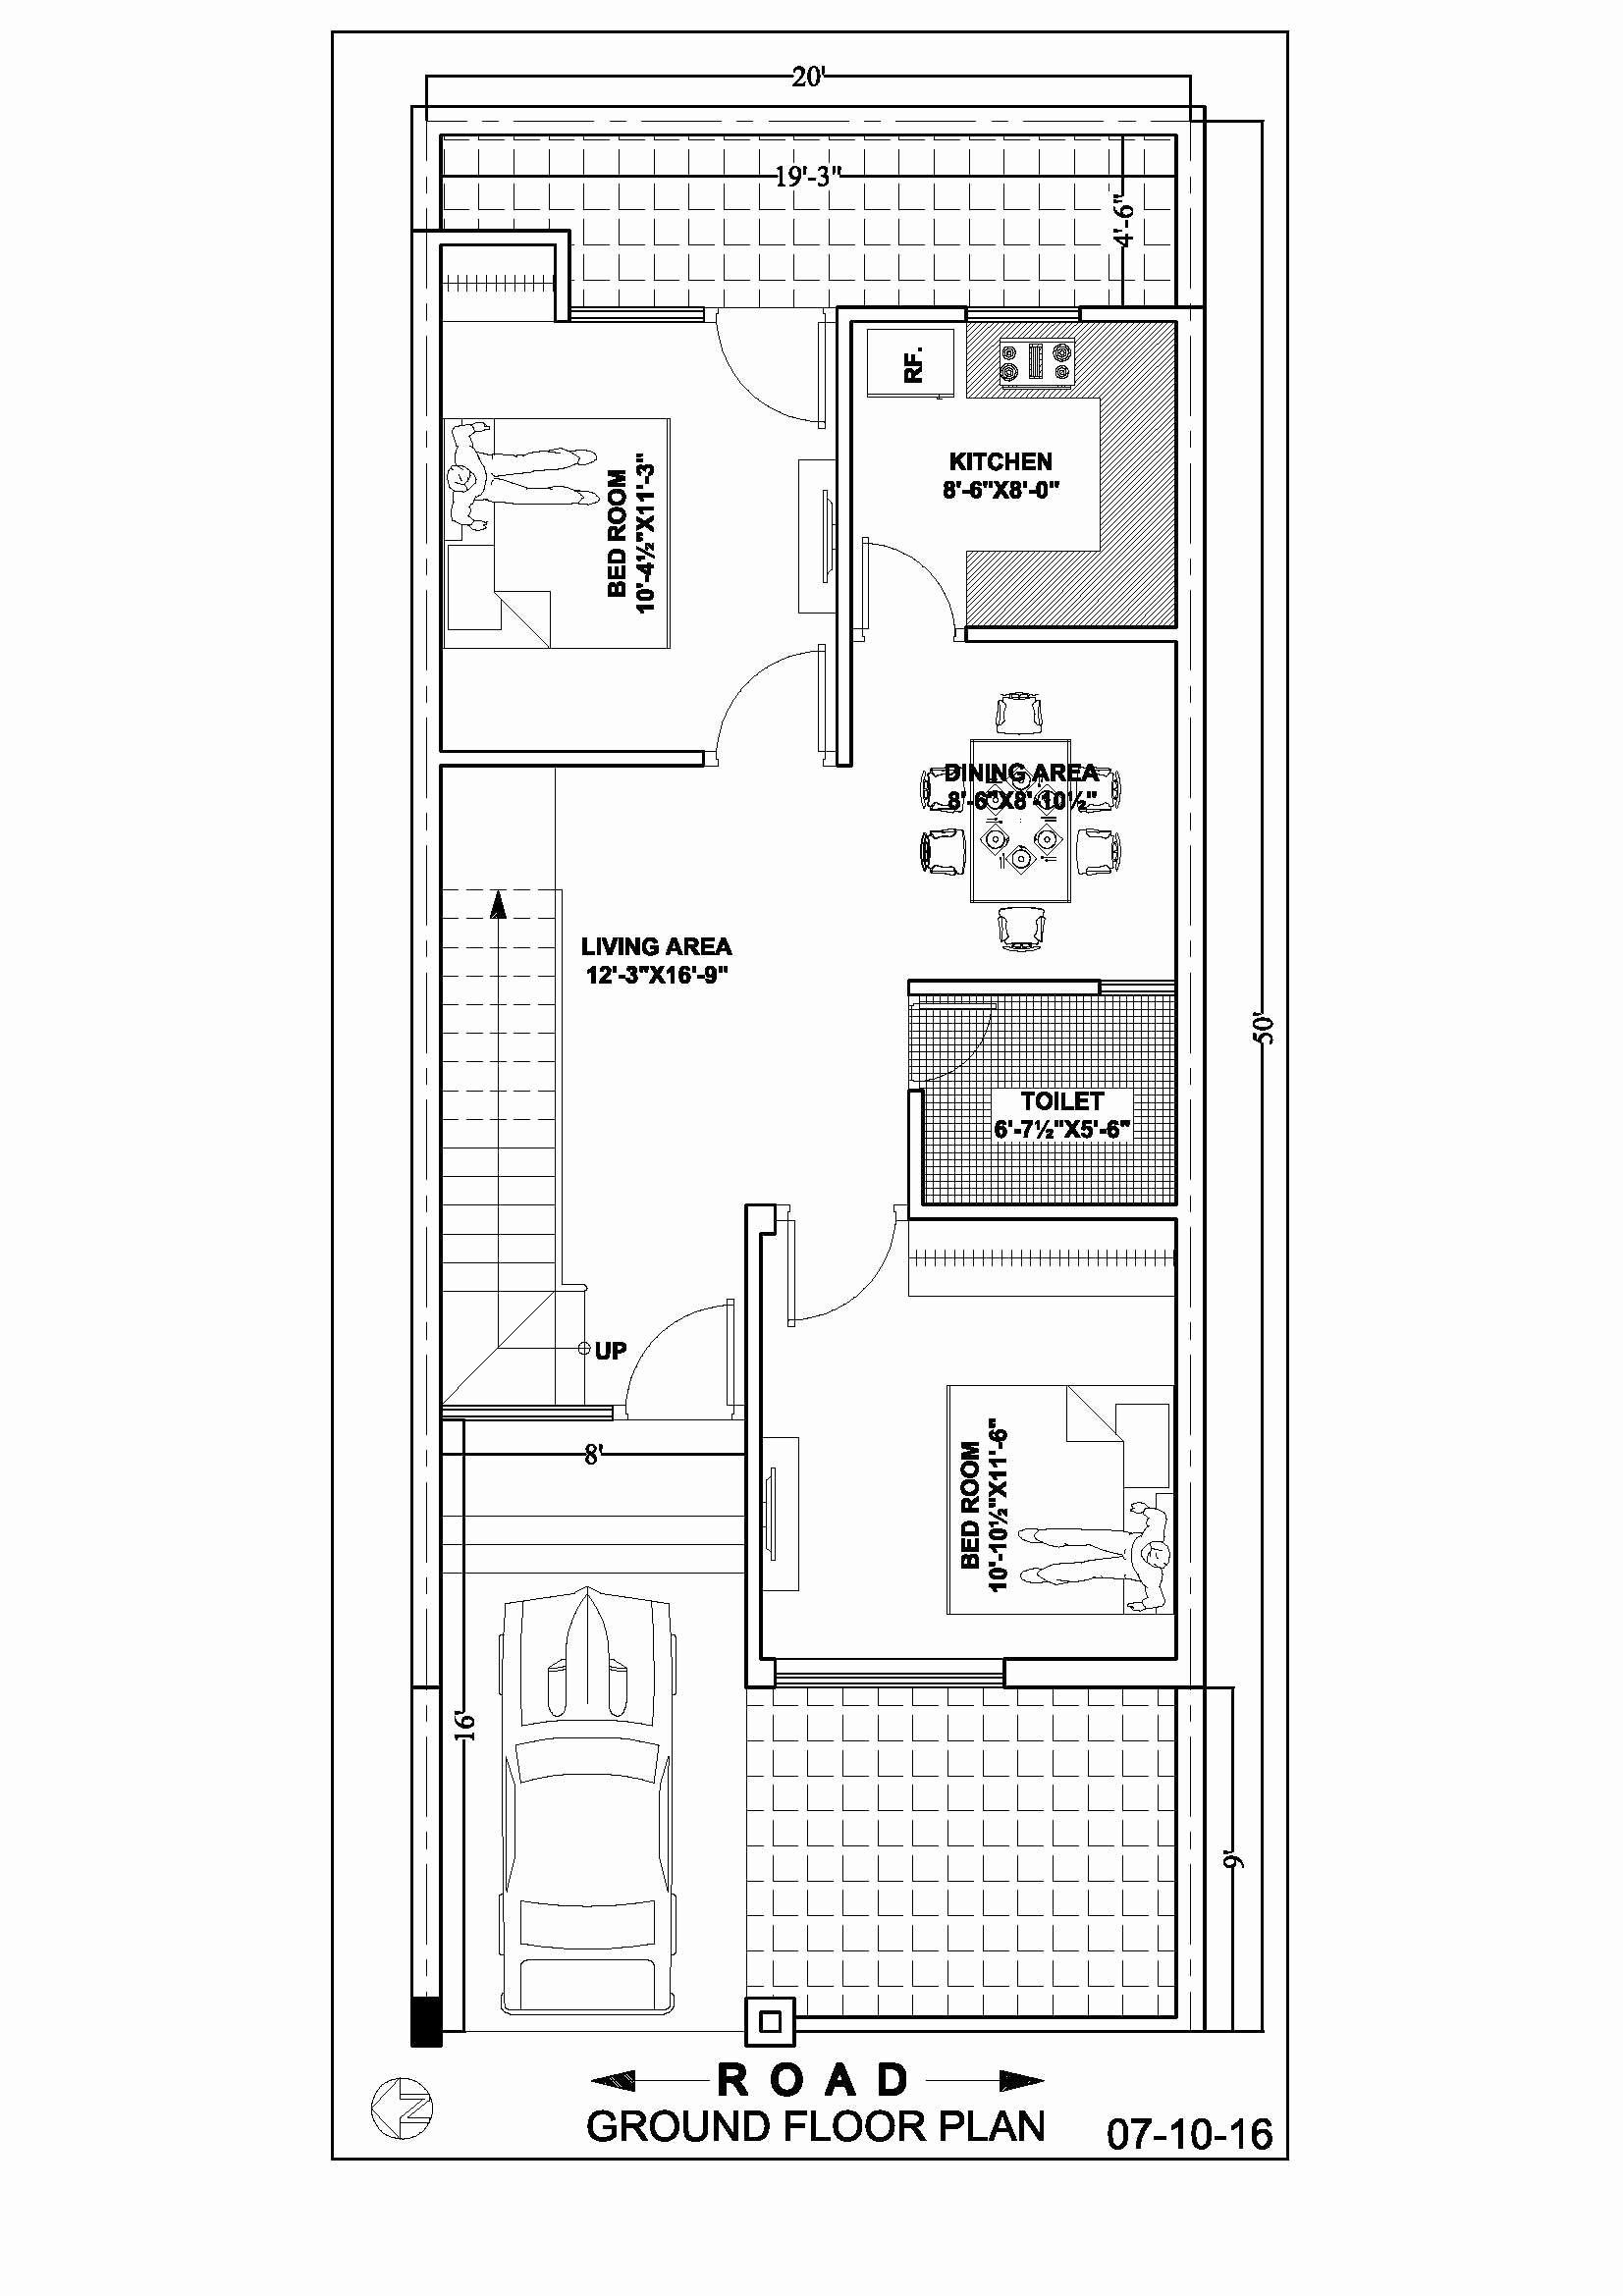 16 X 50 House Plans Best Of 20 50 Duplex House Floor Plan In 2020 20x40 House Plans Indian House Plans Duplex House Plans